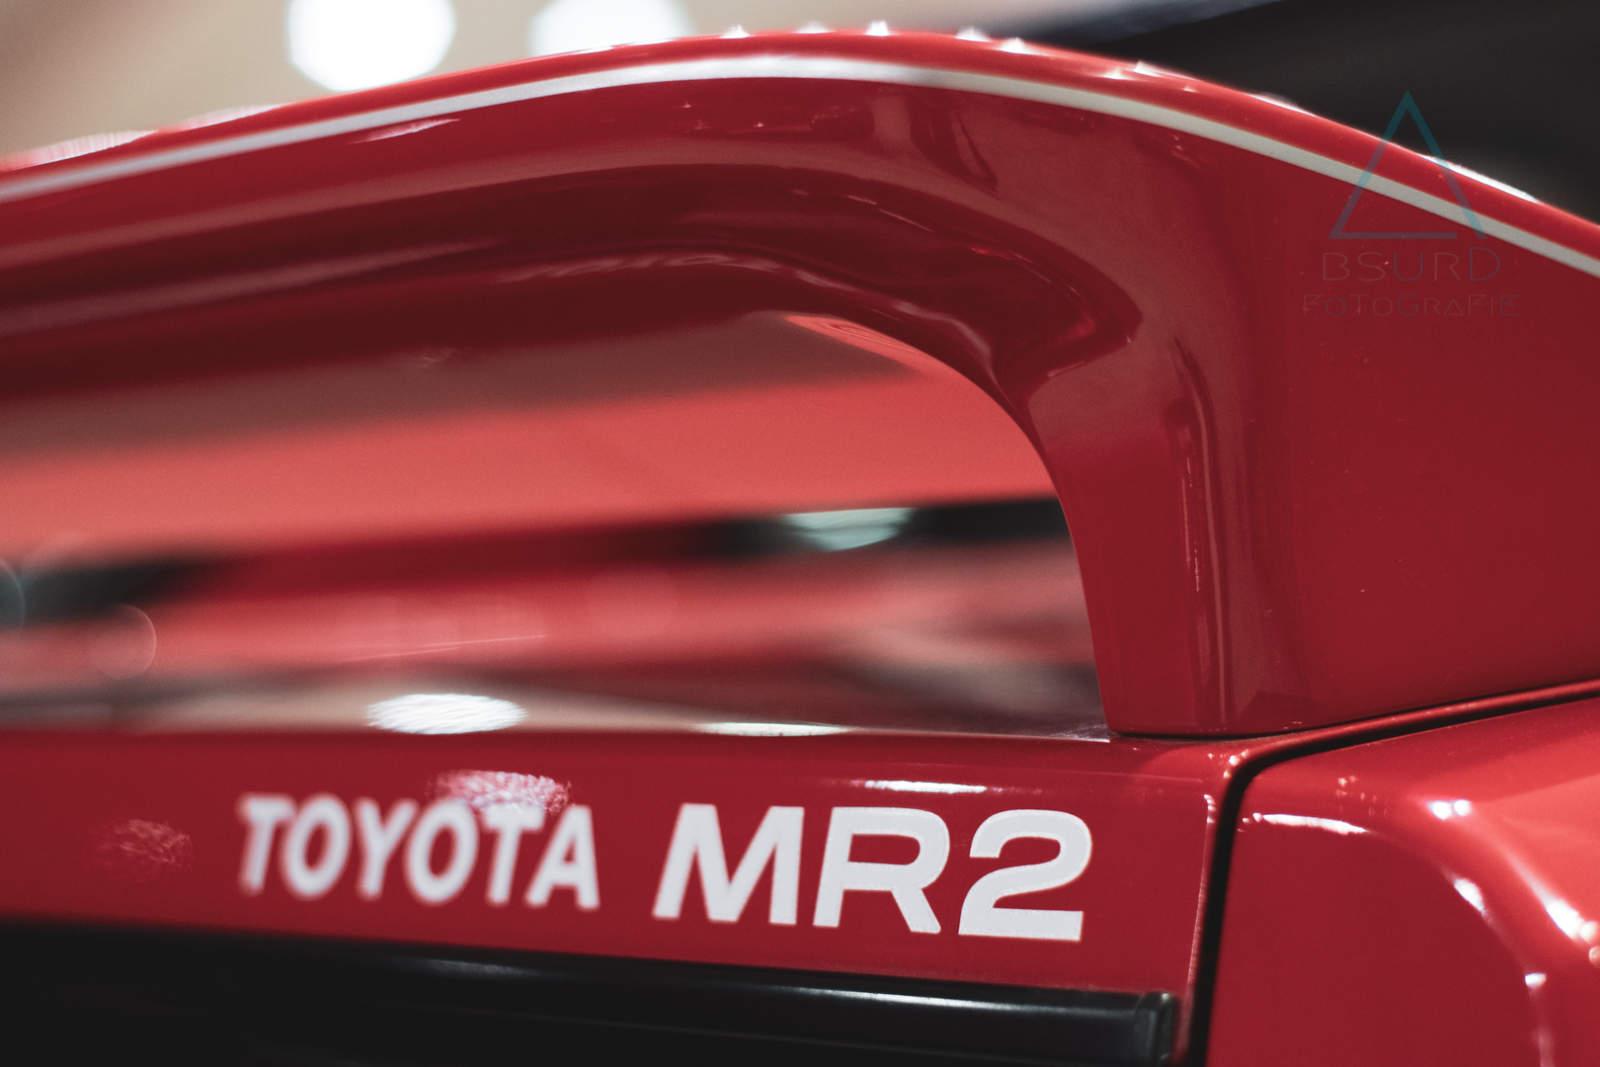 2019-01-05-Toyota-Collection-Koeln - DSC01758-edit-81.jpg